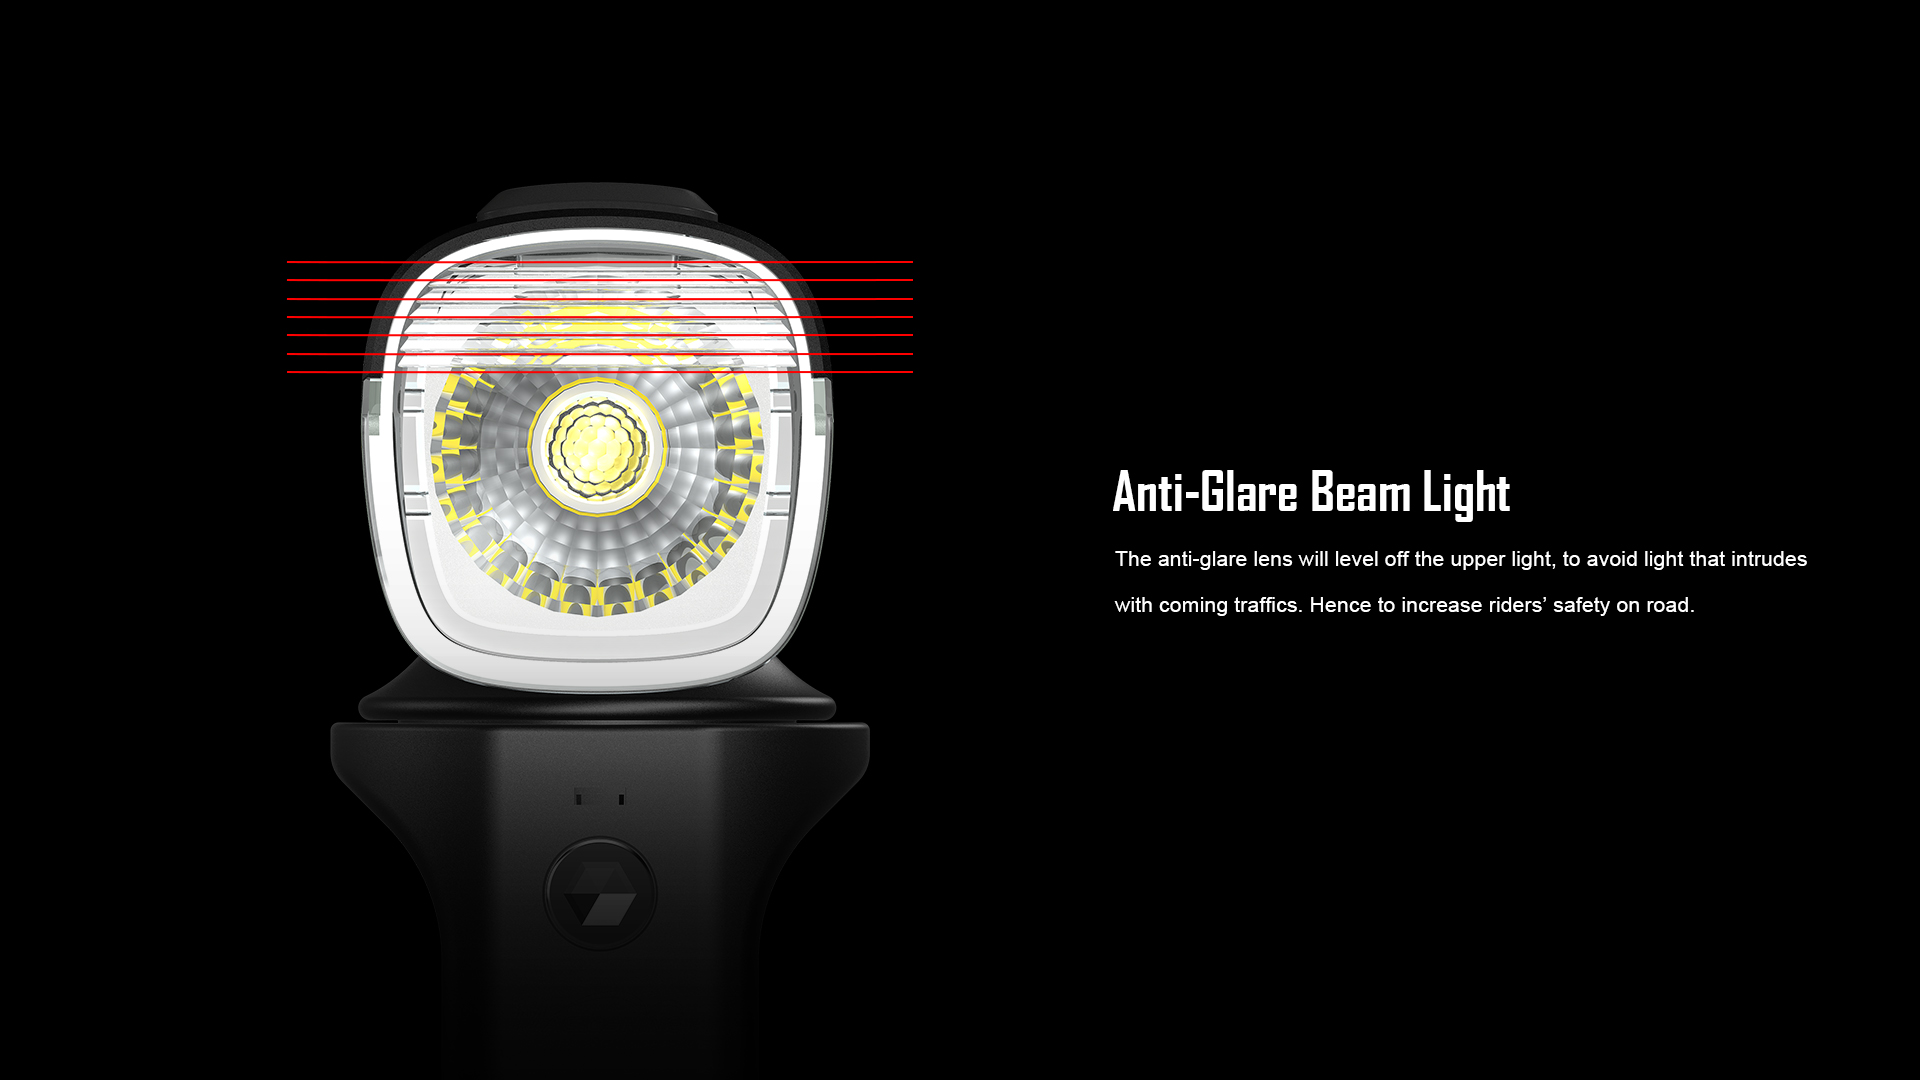 Anti-Glare Beam Light RN1500 Bicycle Front Light